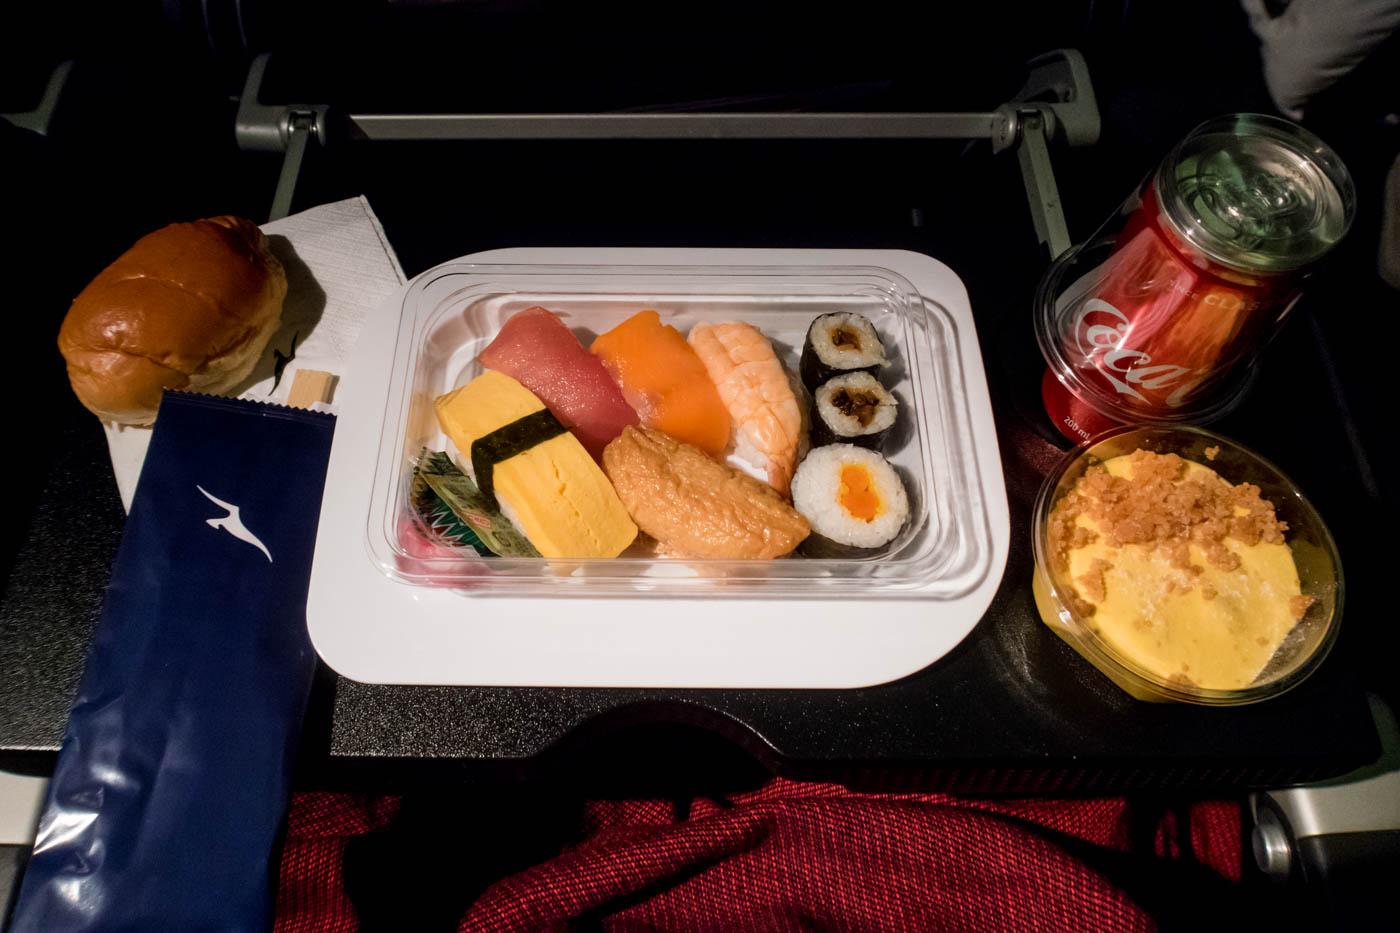 Qantas Long-Haul Economy Class Meal